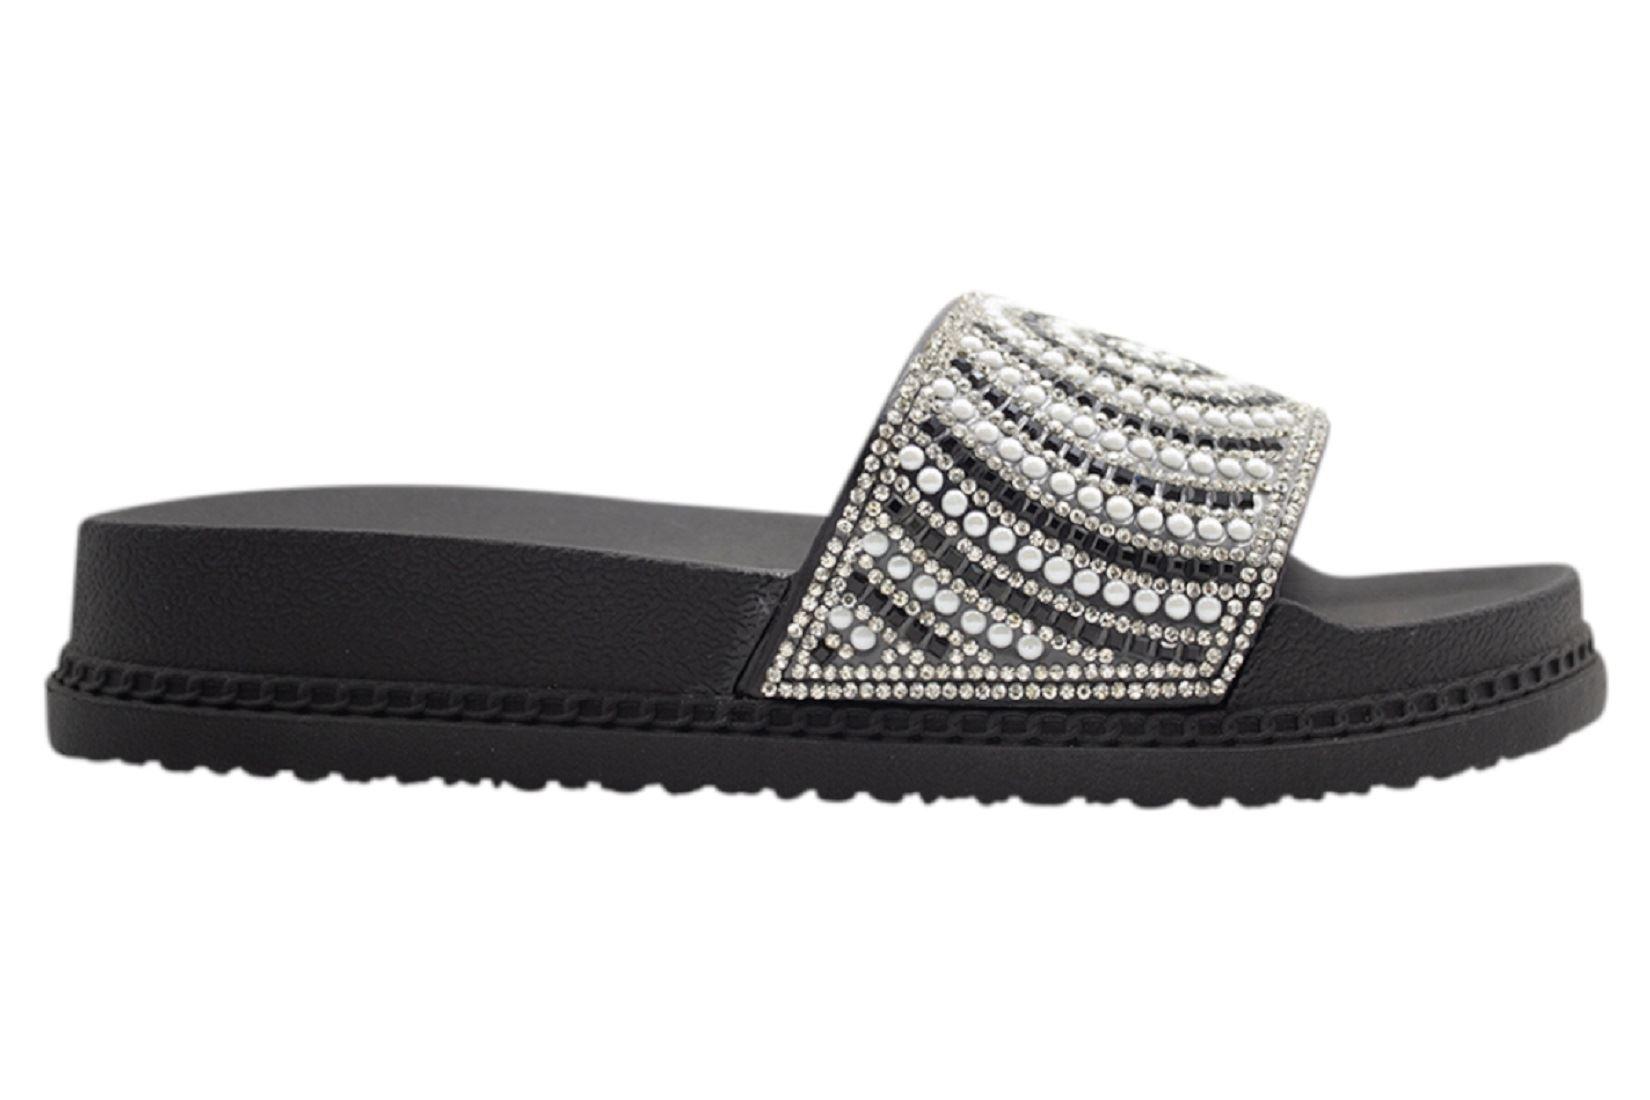 Womens-Sliders-Casual-Slippers-Mules-Ladies-Diamante-Flip-Flop-Sandals-Shoes thumbnail 18